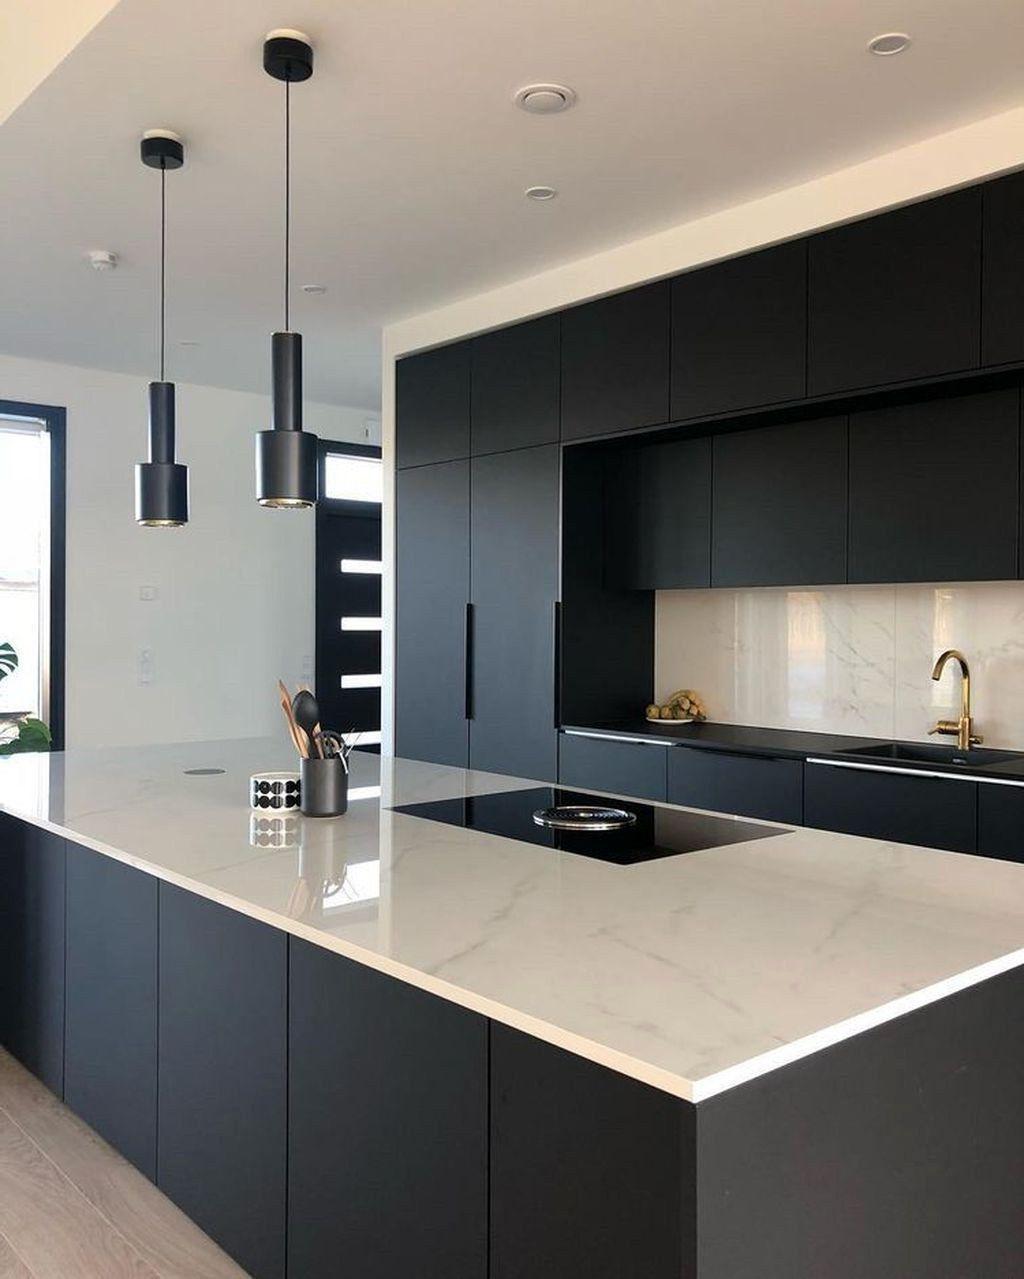 31 Wonderful Lu Ury Kitchens Design Ideas With Modern Style 30 Best Inspiration Ideas That You Want Luxury Kitchen Design Modern Kitchen Design House Design Kitchen